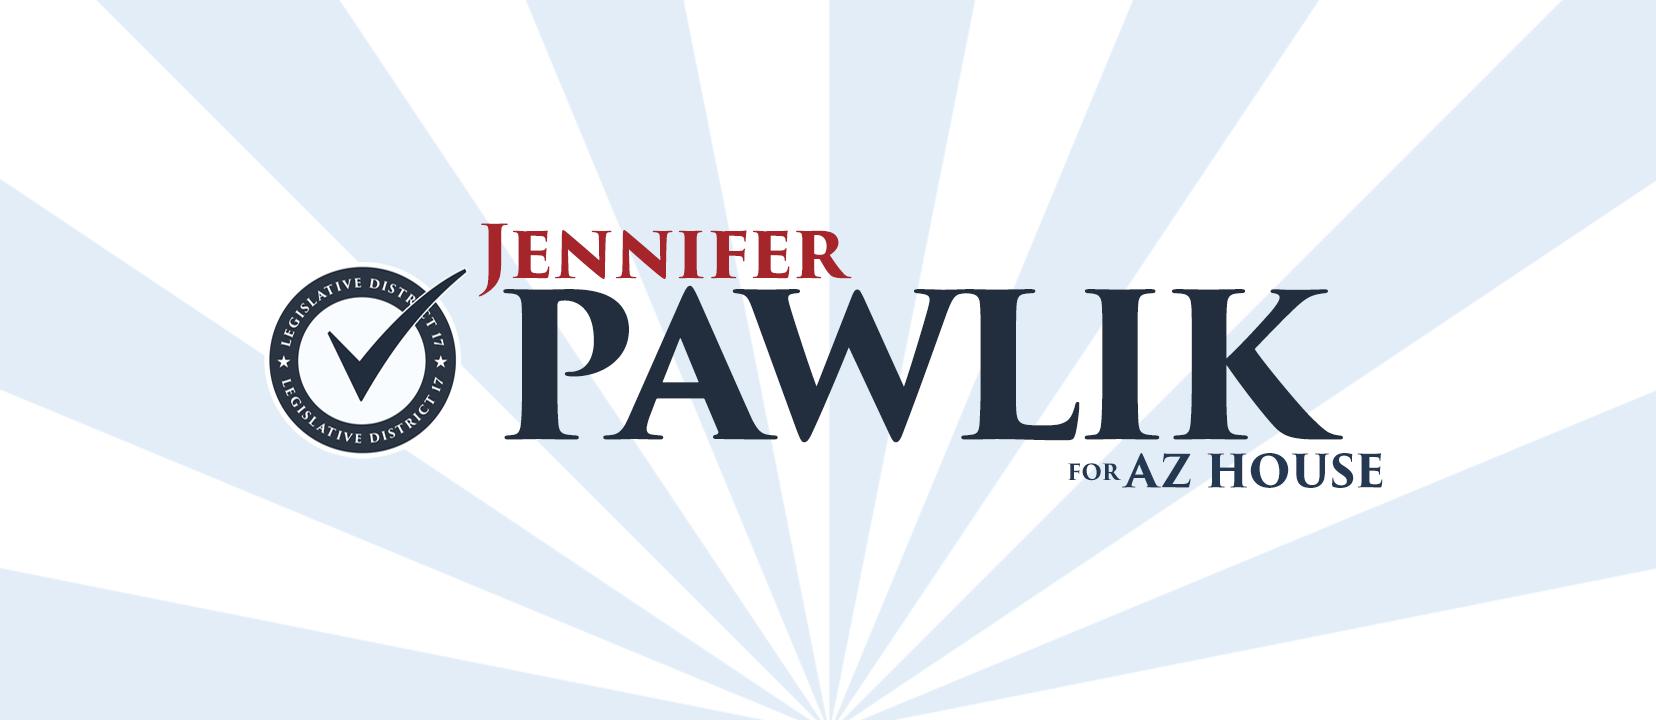 Jennifer Pawlik